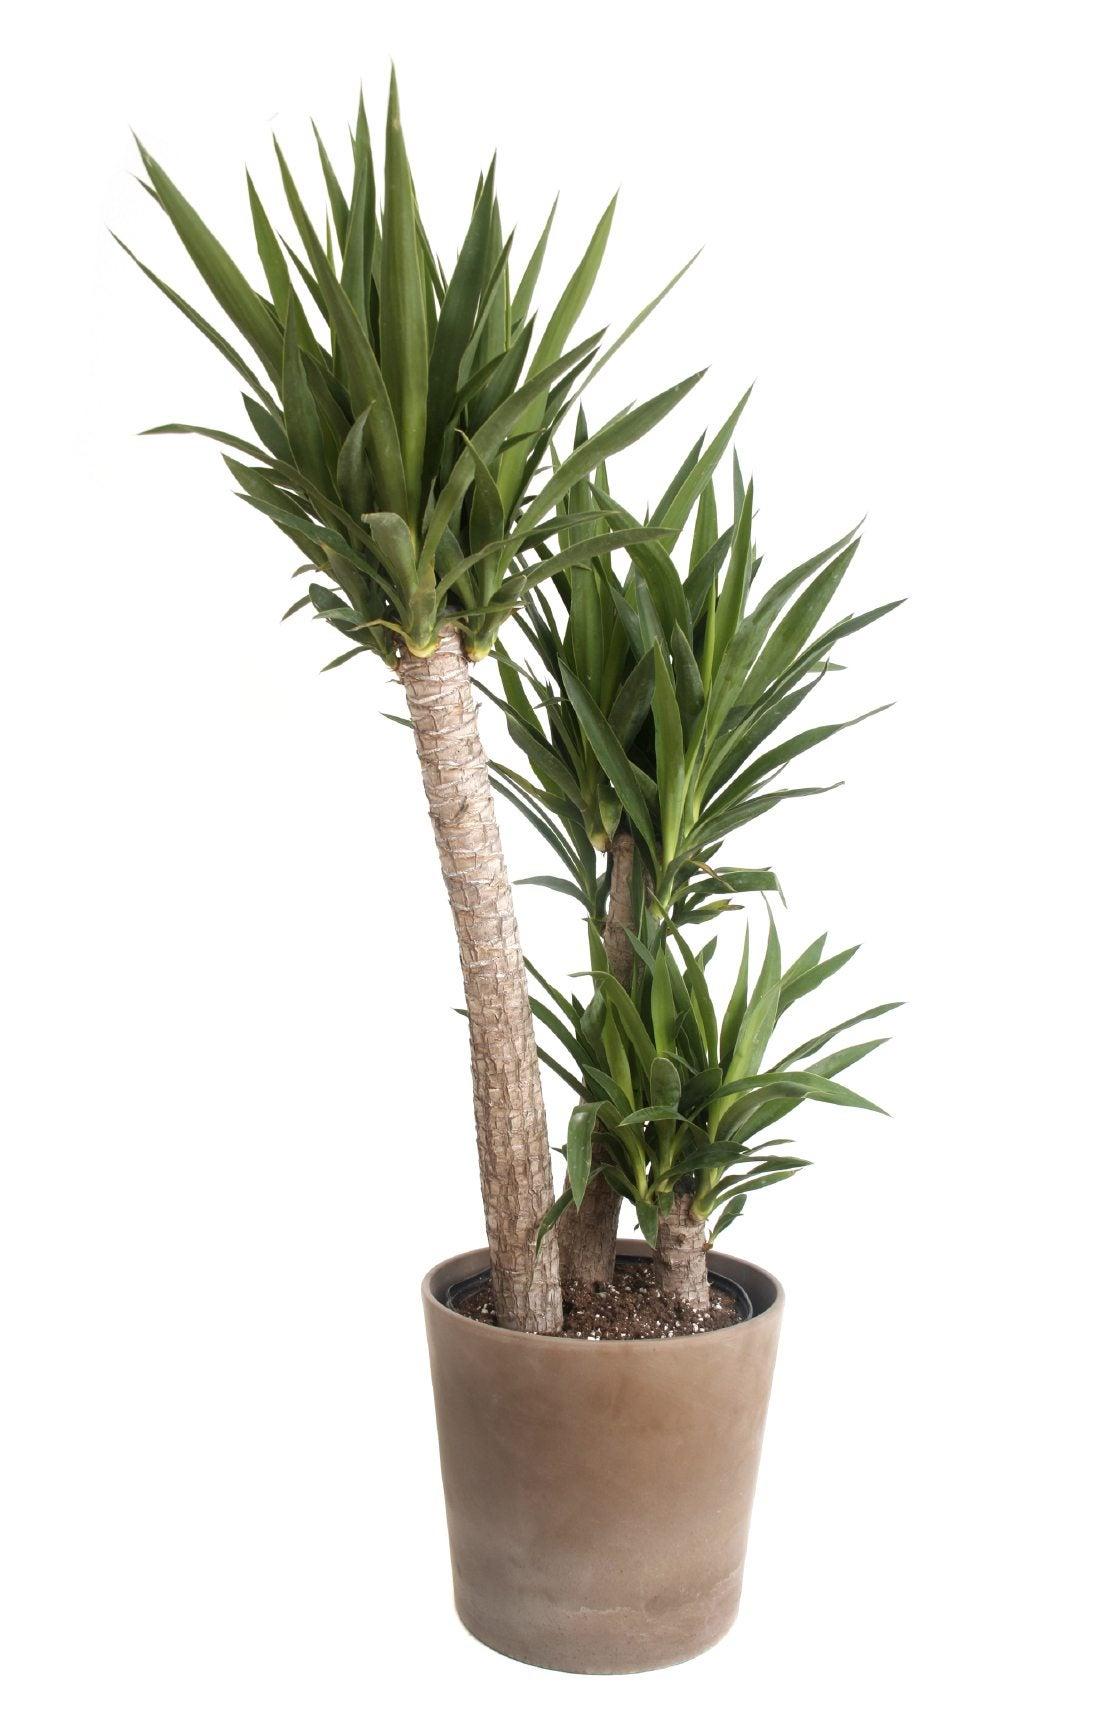 should i repot yucca repotting yucca houseplants and. Black Bedroom Furniture Sets. Home Design Ideas